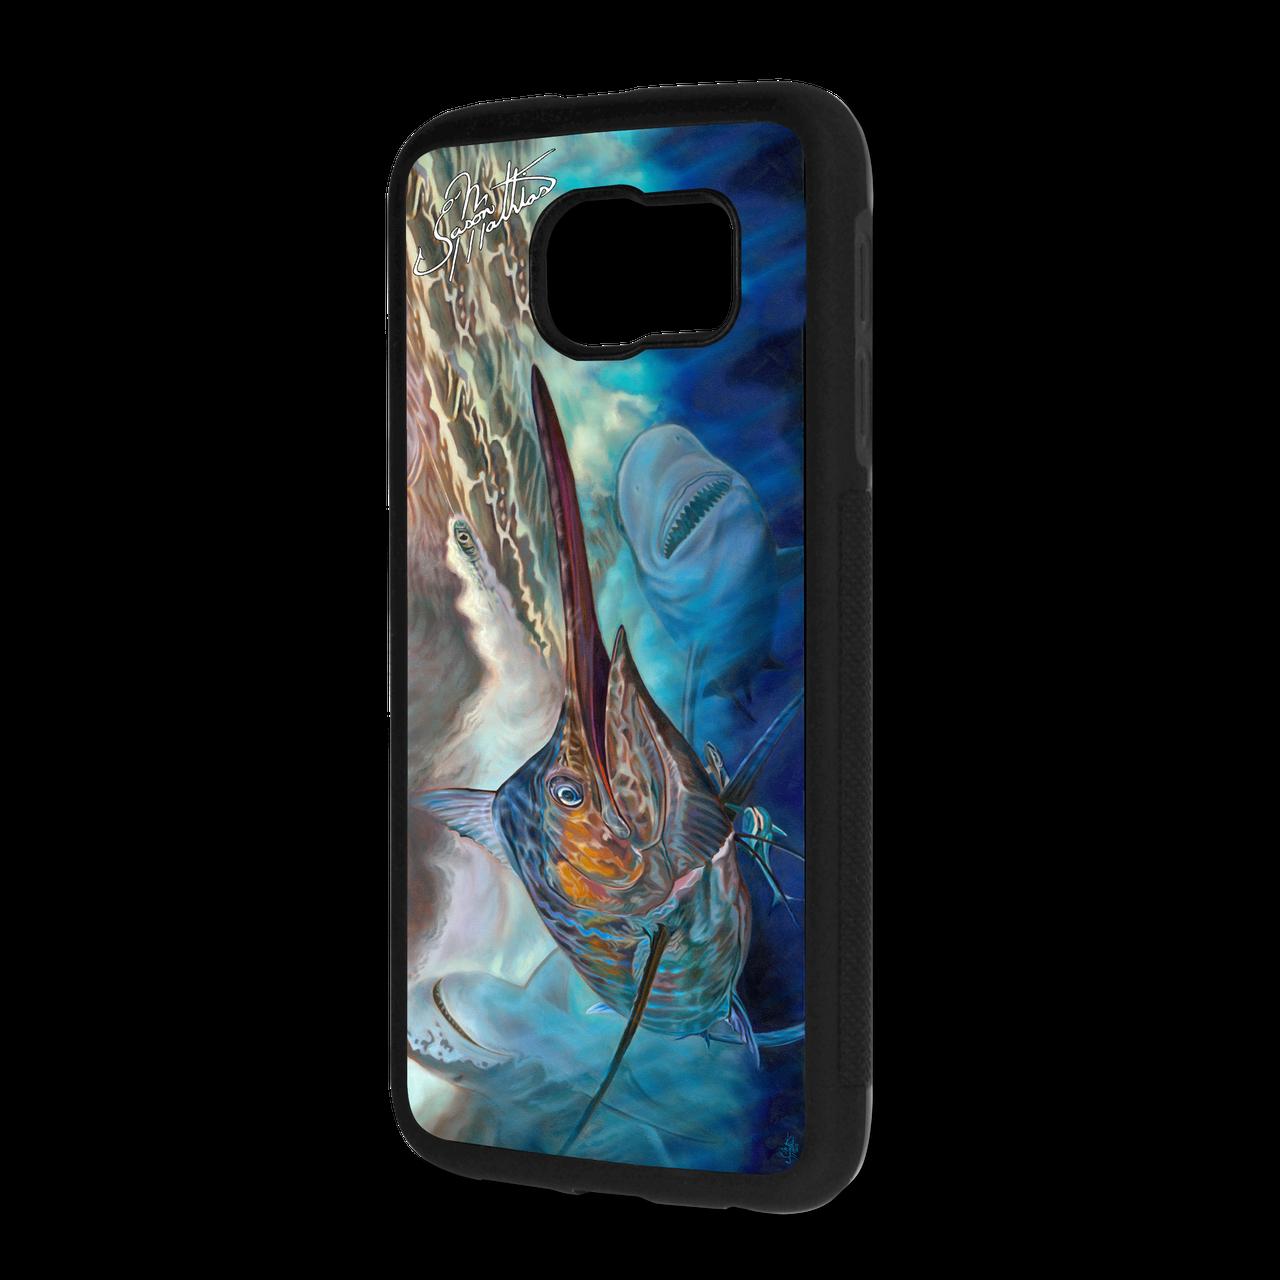 samsung-galaxy-blue-marlin-shark-case-cover-jason-mathias-art.png